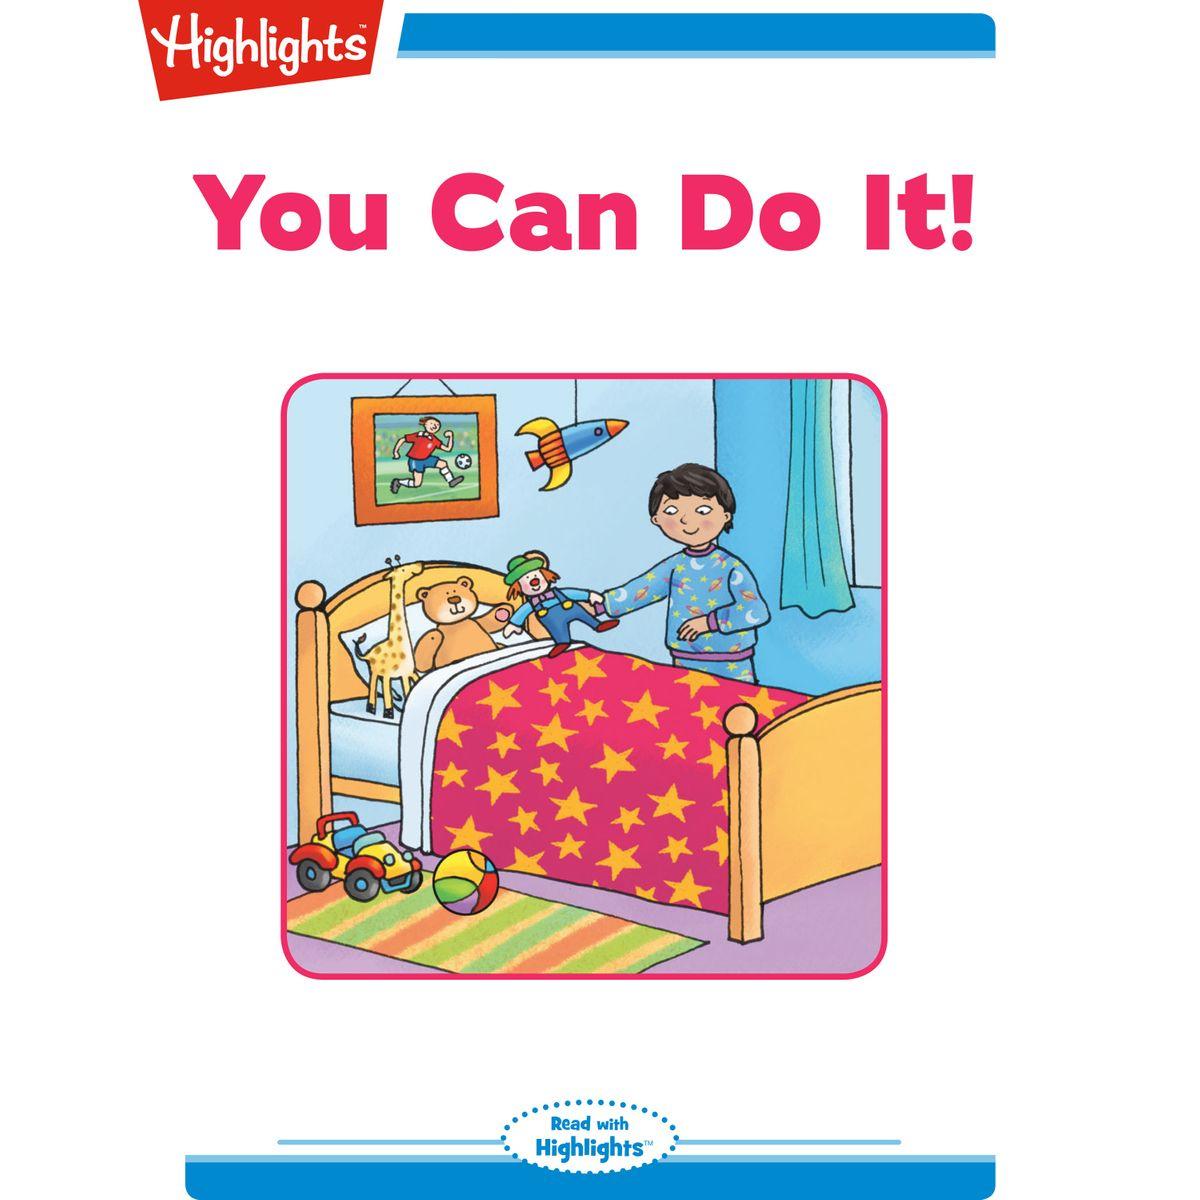 You Can Do It Livre Audio By Highlights For Children - Rakuten Kobo dedans Paper Toy Gratuit